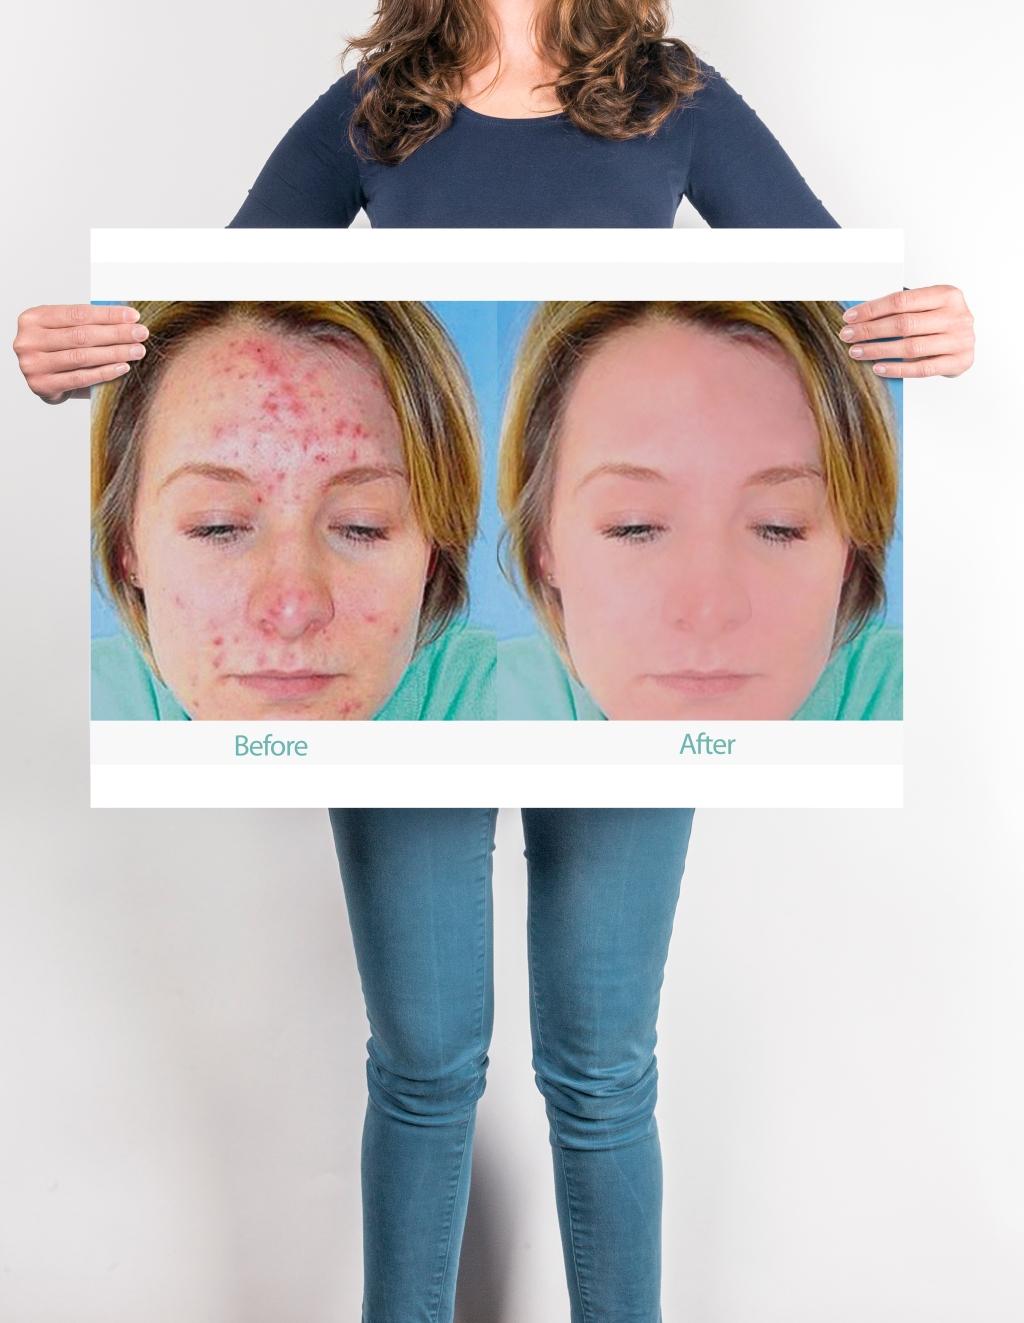 Skin Clearing Photo Retouching